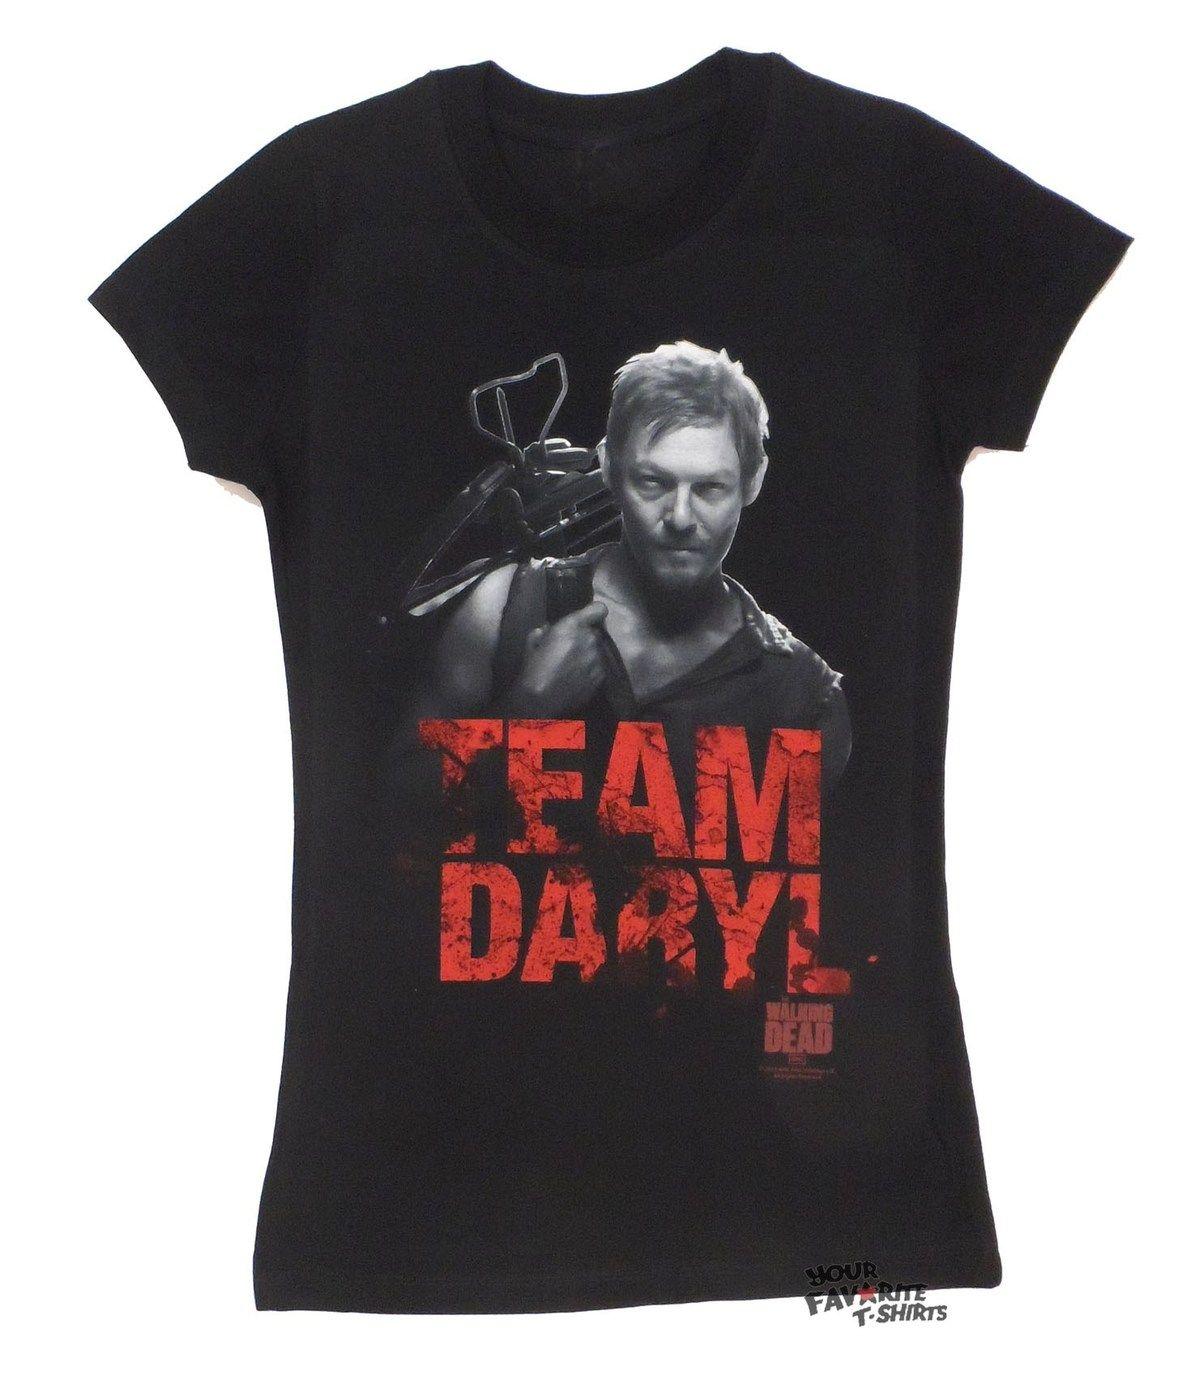 Walking Dead Team Daryl Junior Ladies T-Shirt New